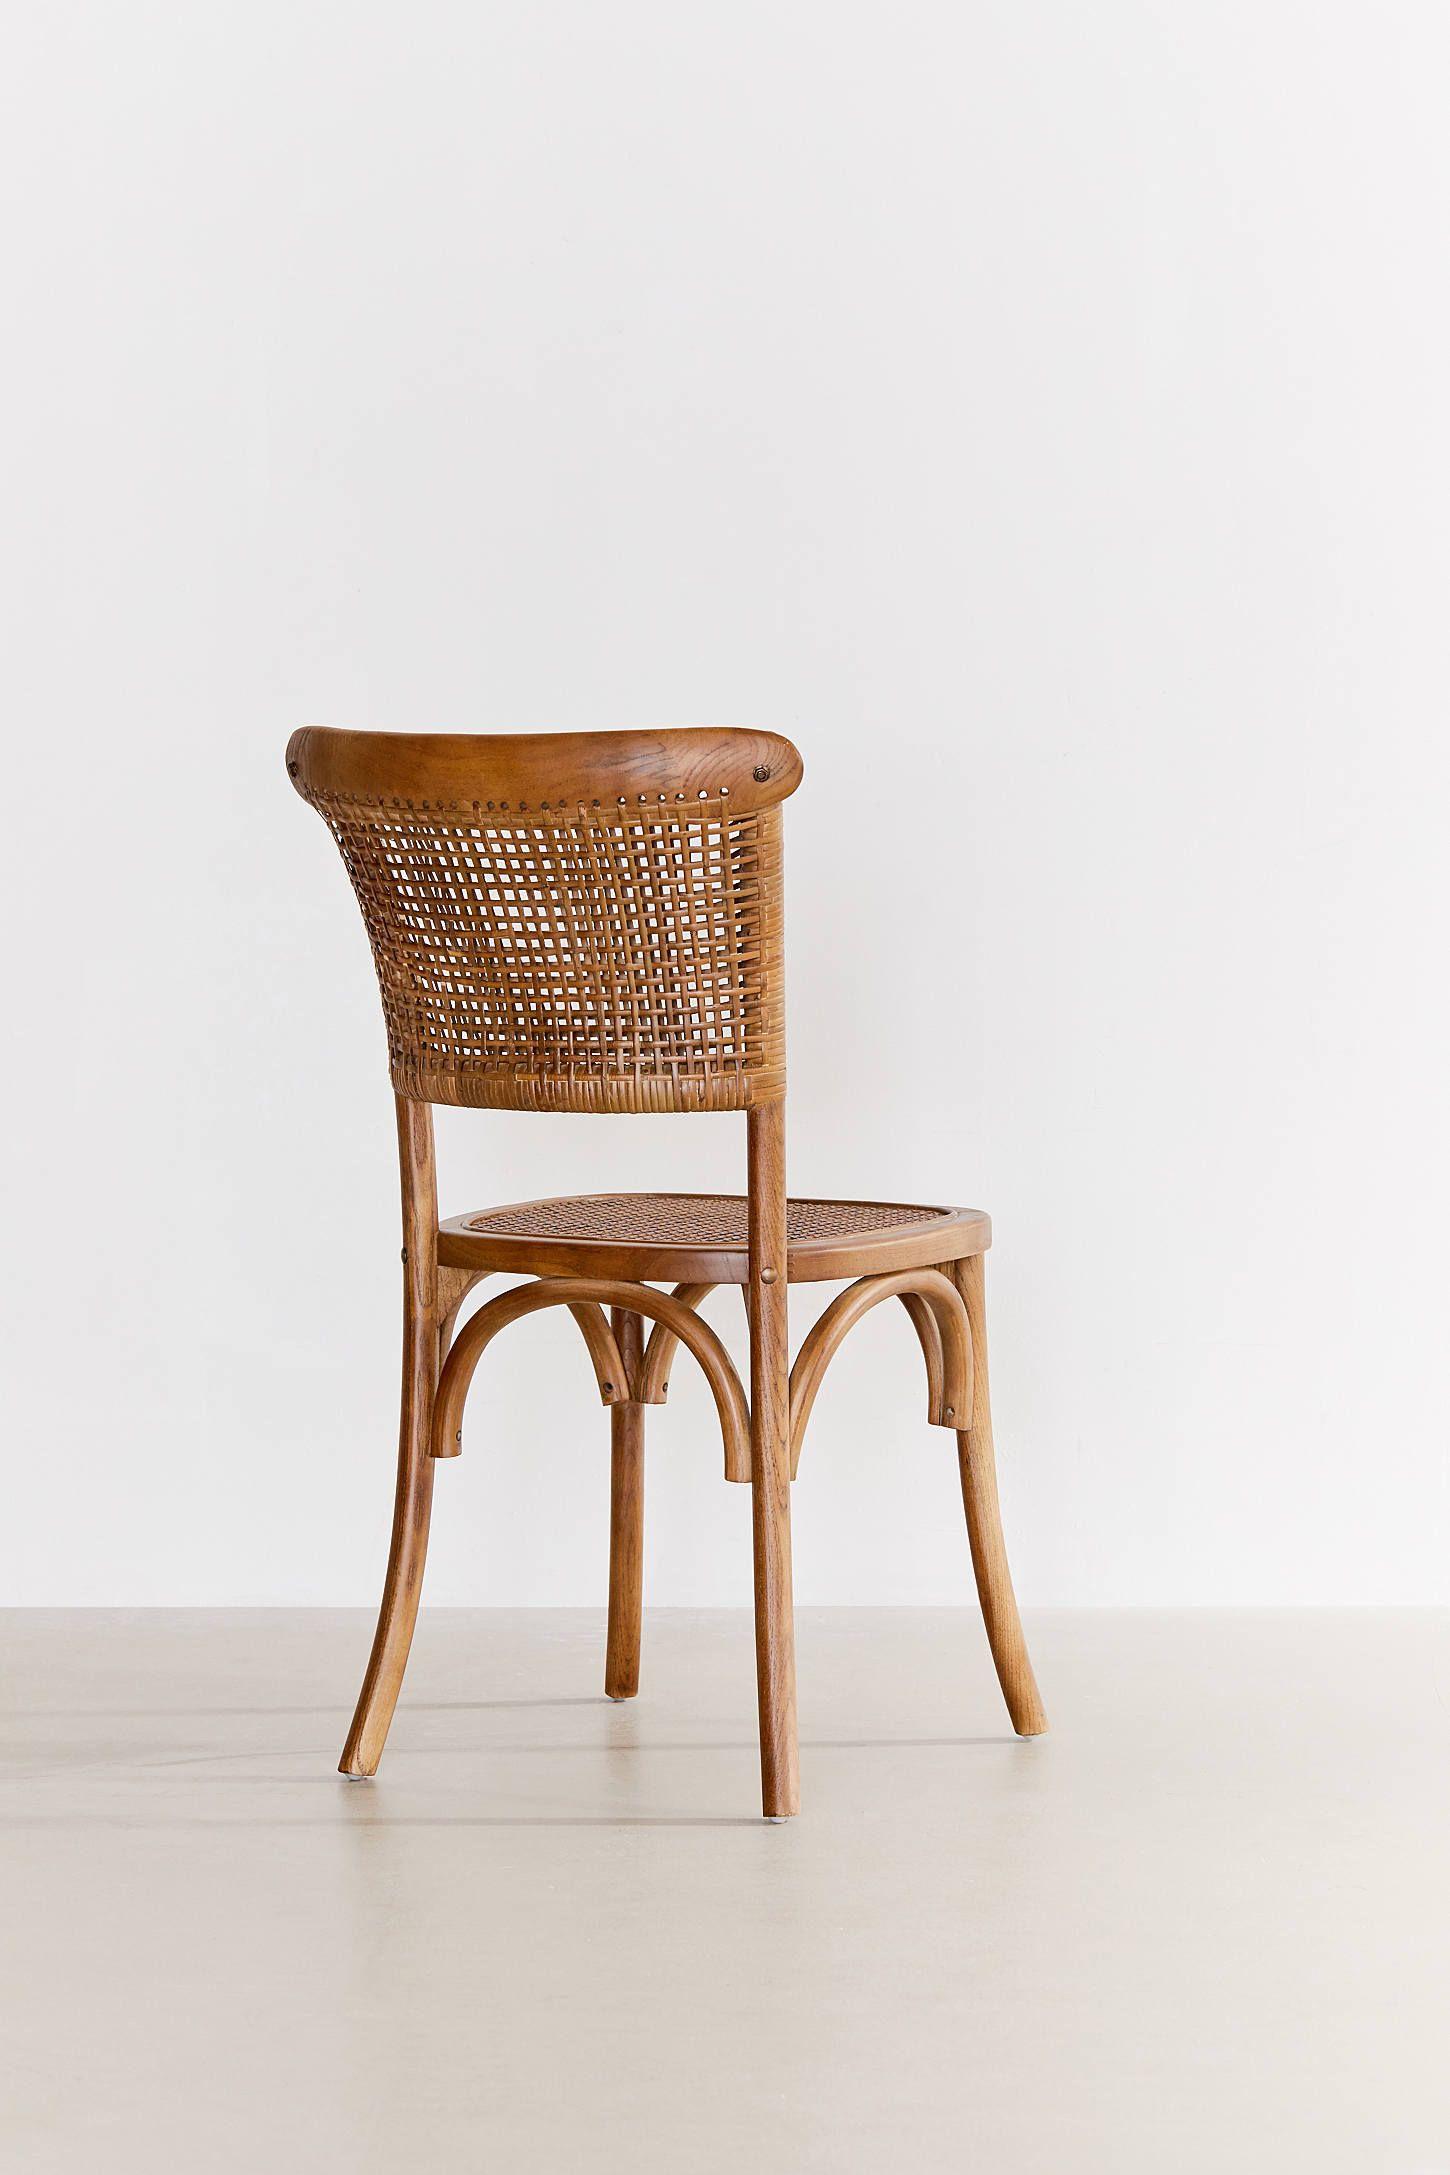 Chelsi Rattan Chair Set Of 2 In 2021 Rattan Chair Rattan Lounge Chair Chair